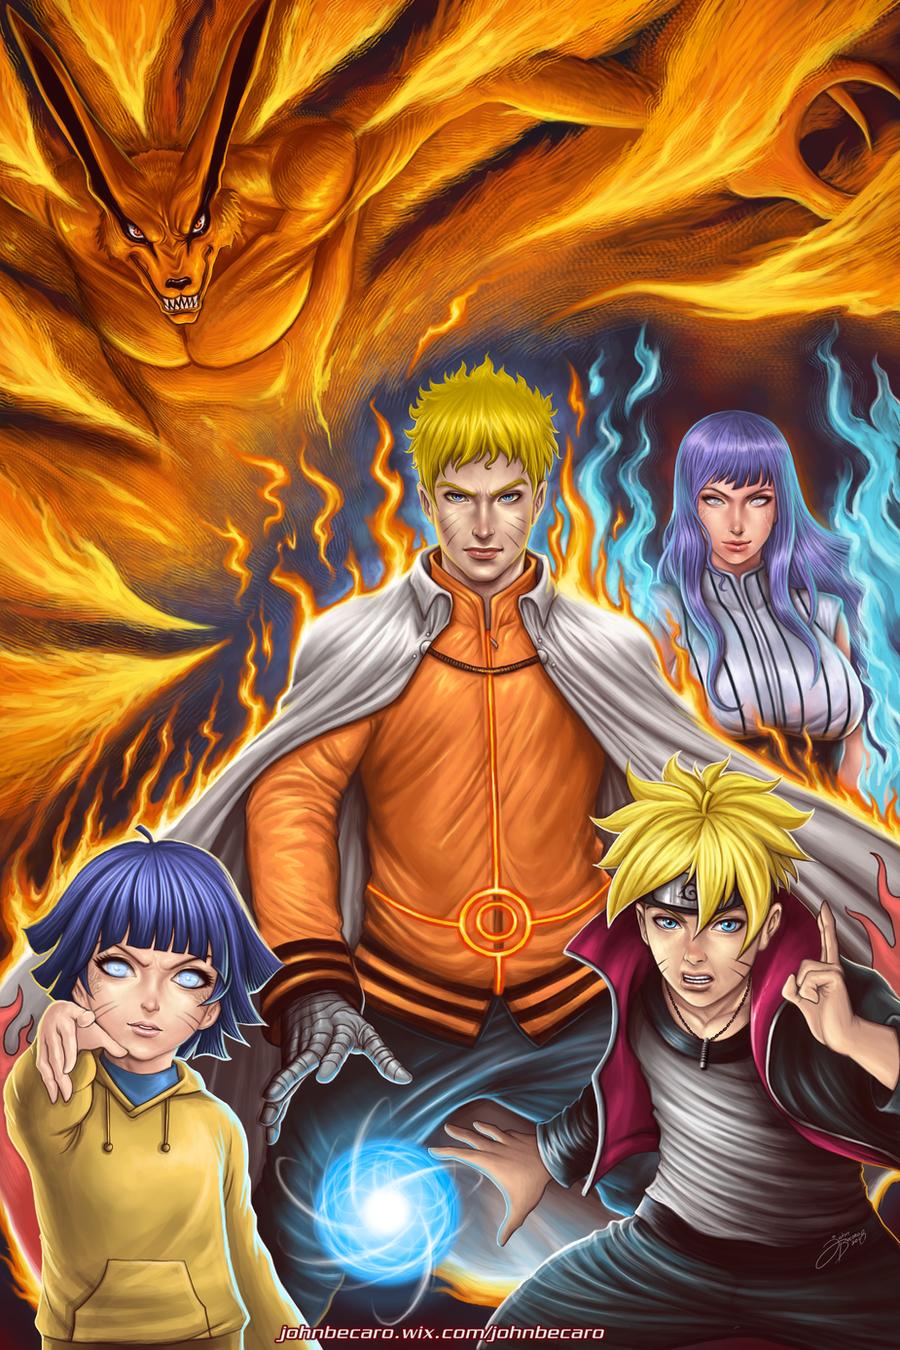 The Uzumaki Family by johnbecaro